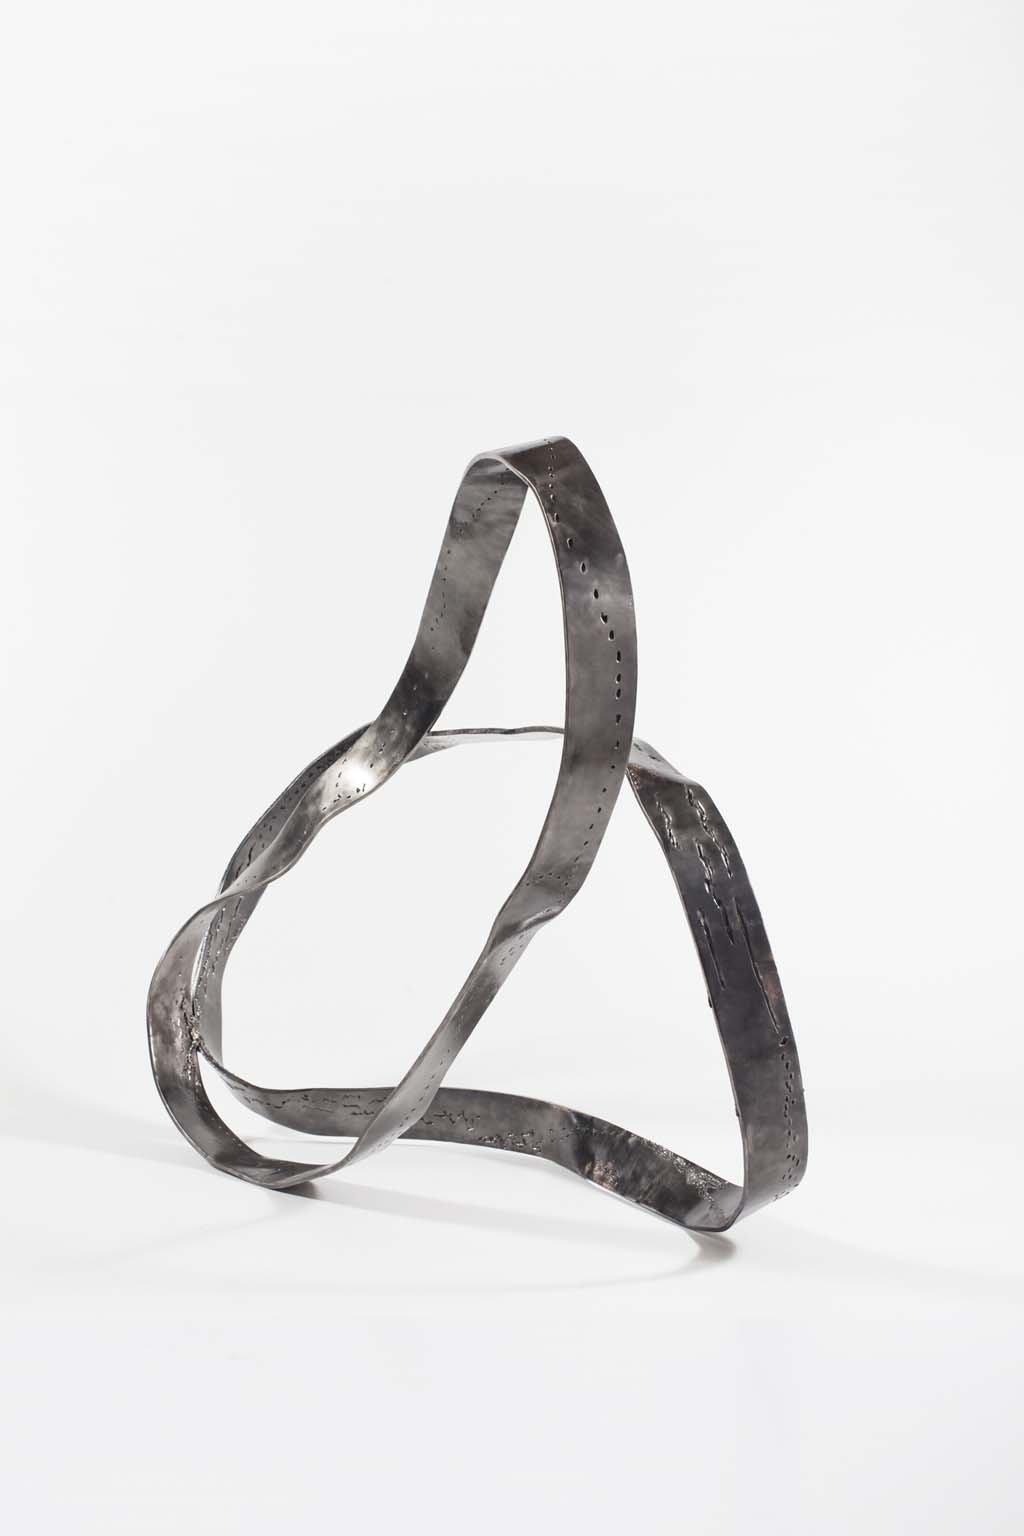 'Oblivion I ' | Iron and brass sculpture | Artist: Rami Ater